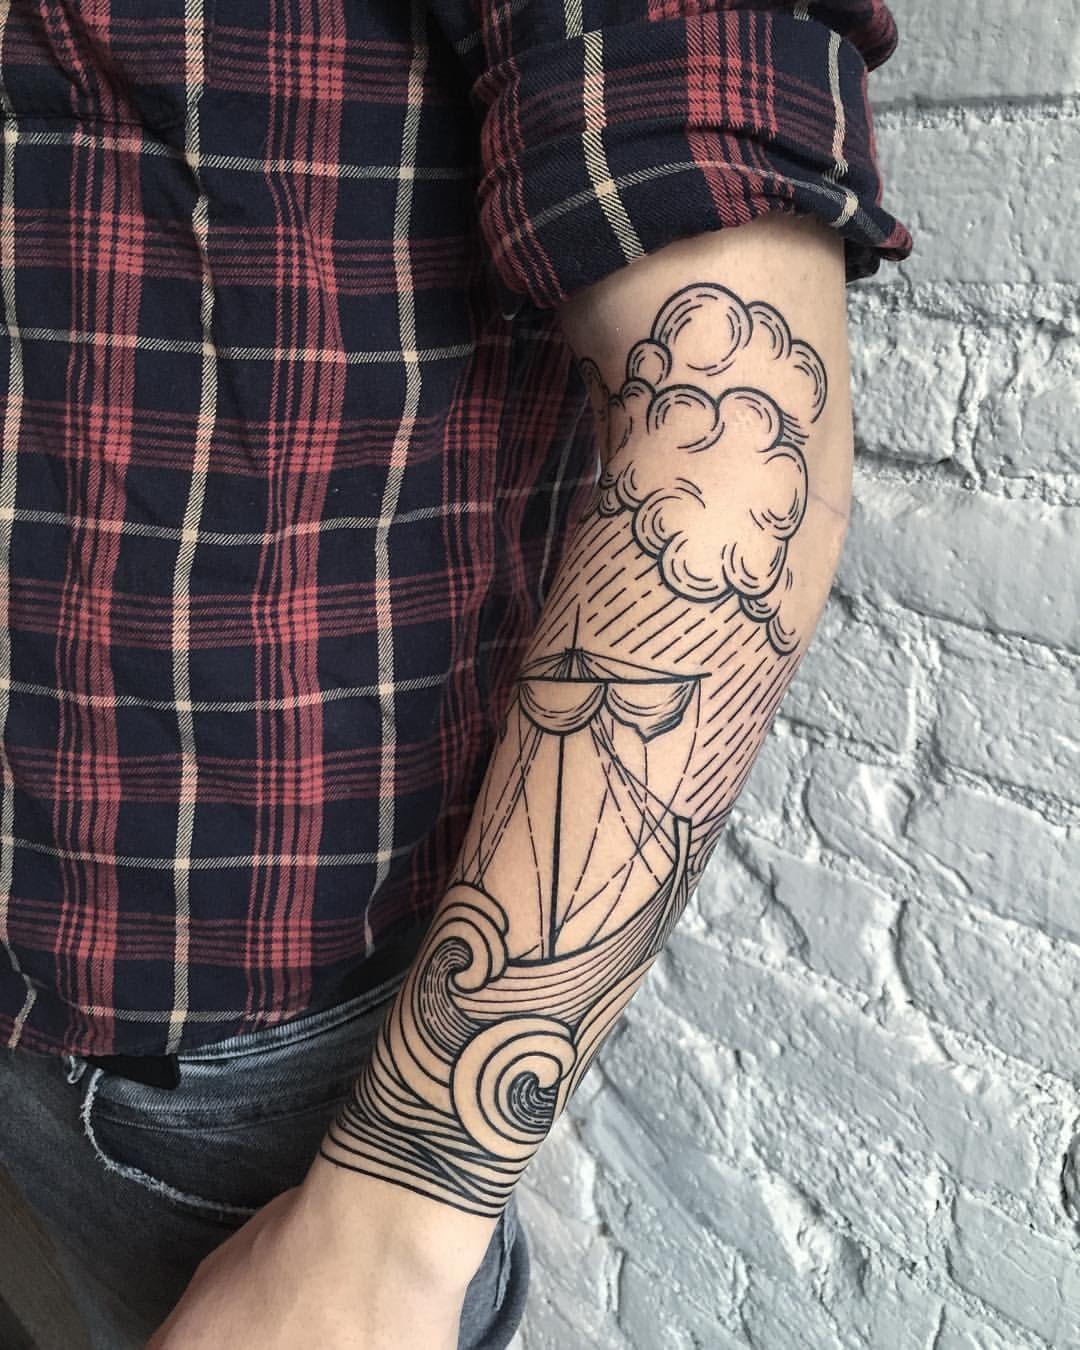 Tattoo Designs Sleeve: Love This Nautical Half Sleeve!